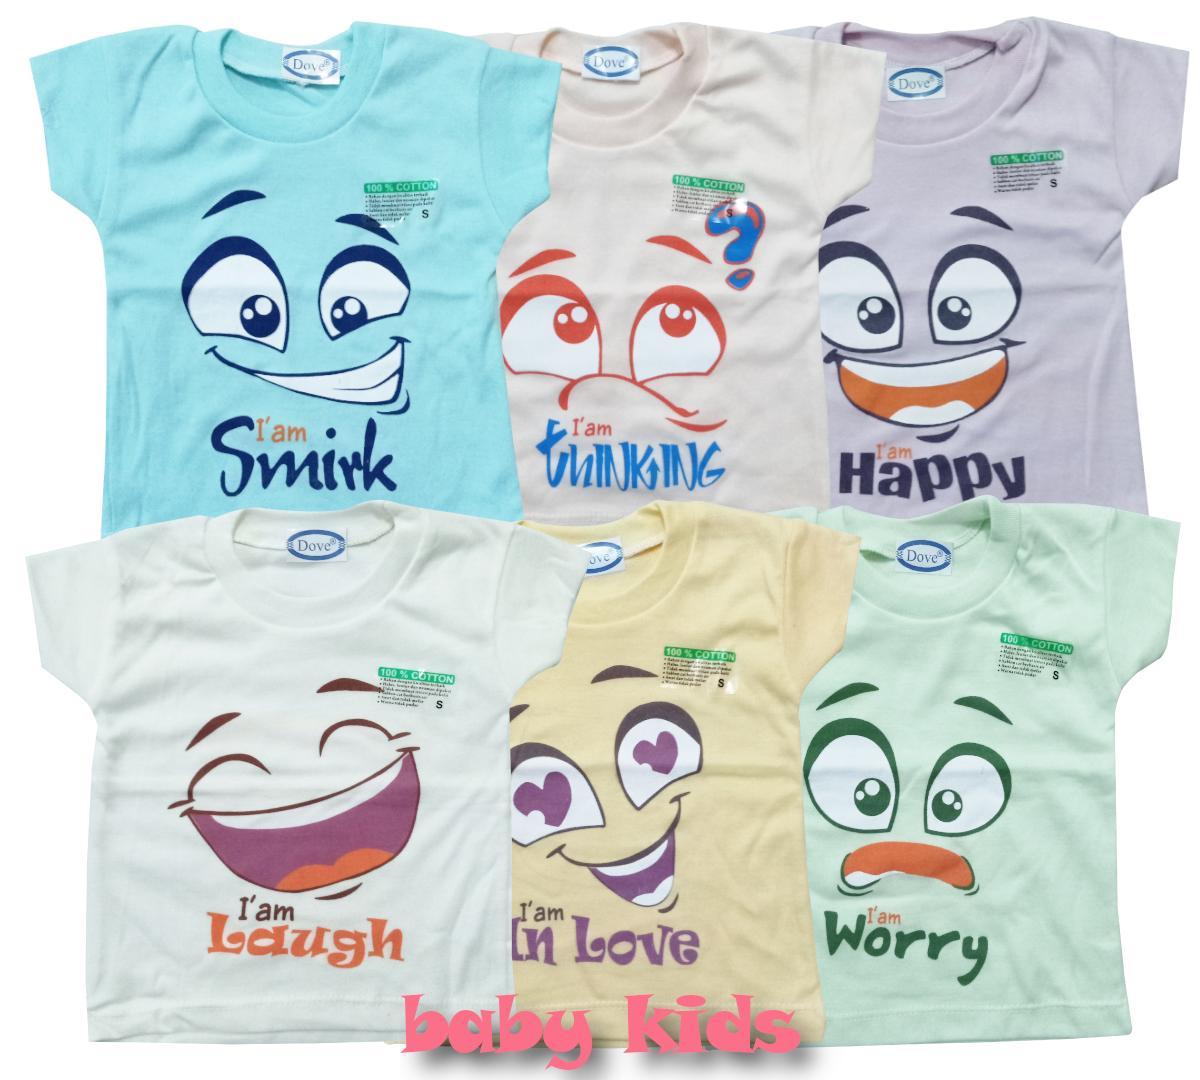 Baju Kaus Oblong Isi 6 Pcs Kaos Warna Motif Anak Bayi Laki Laki Dan Perempuan Dove By Baby Kids.